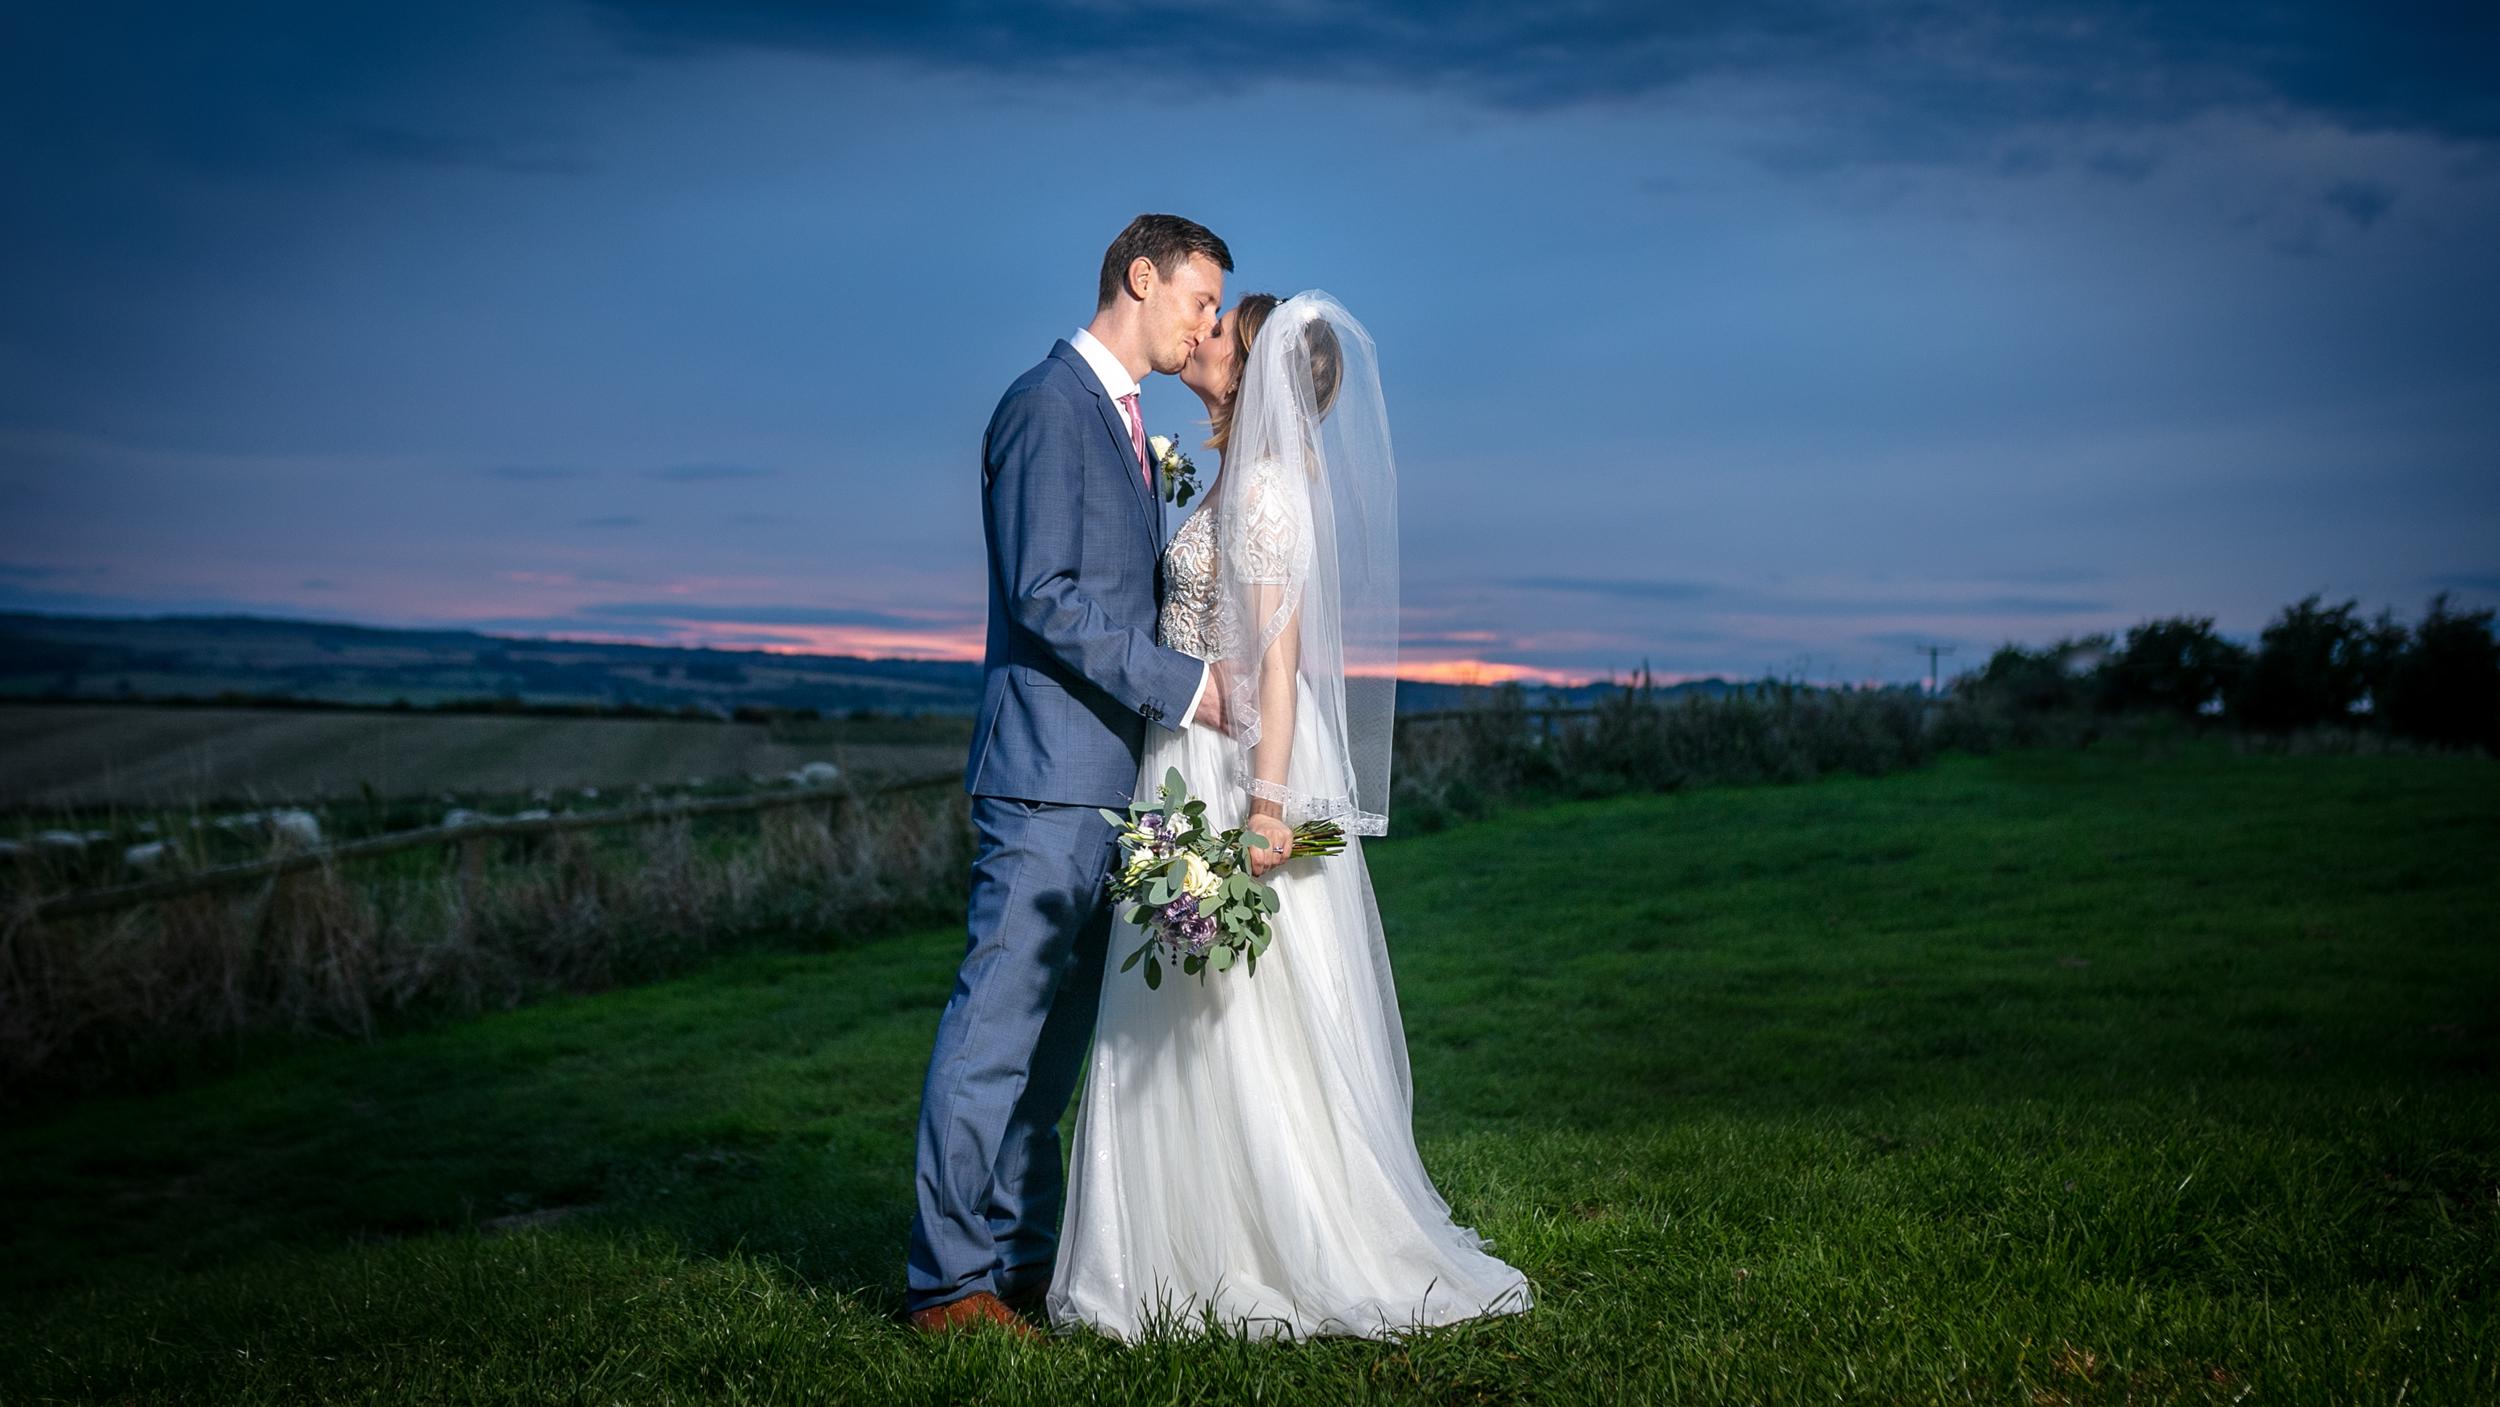 Charringworth-Manor-Wedding-Photography44.jpg